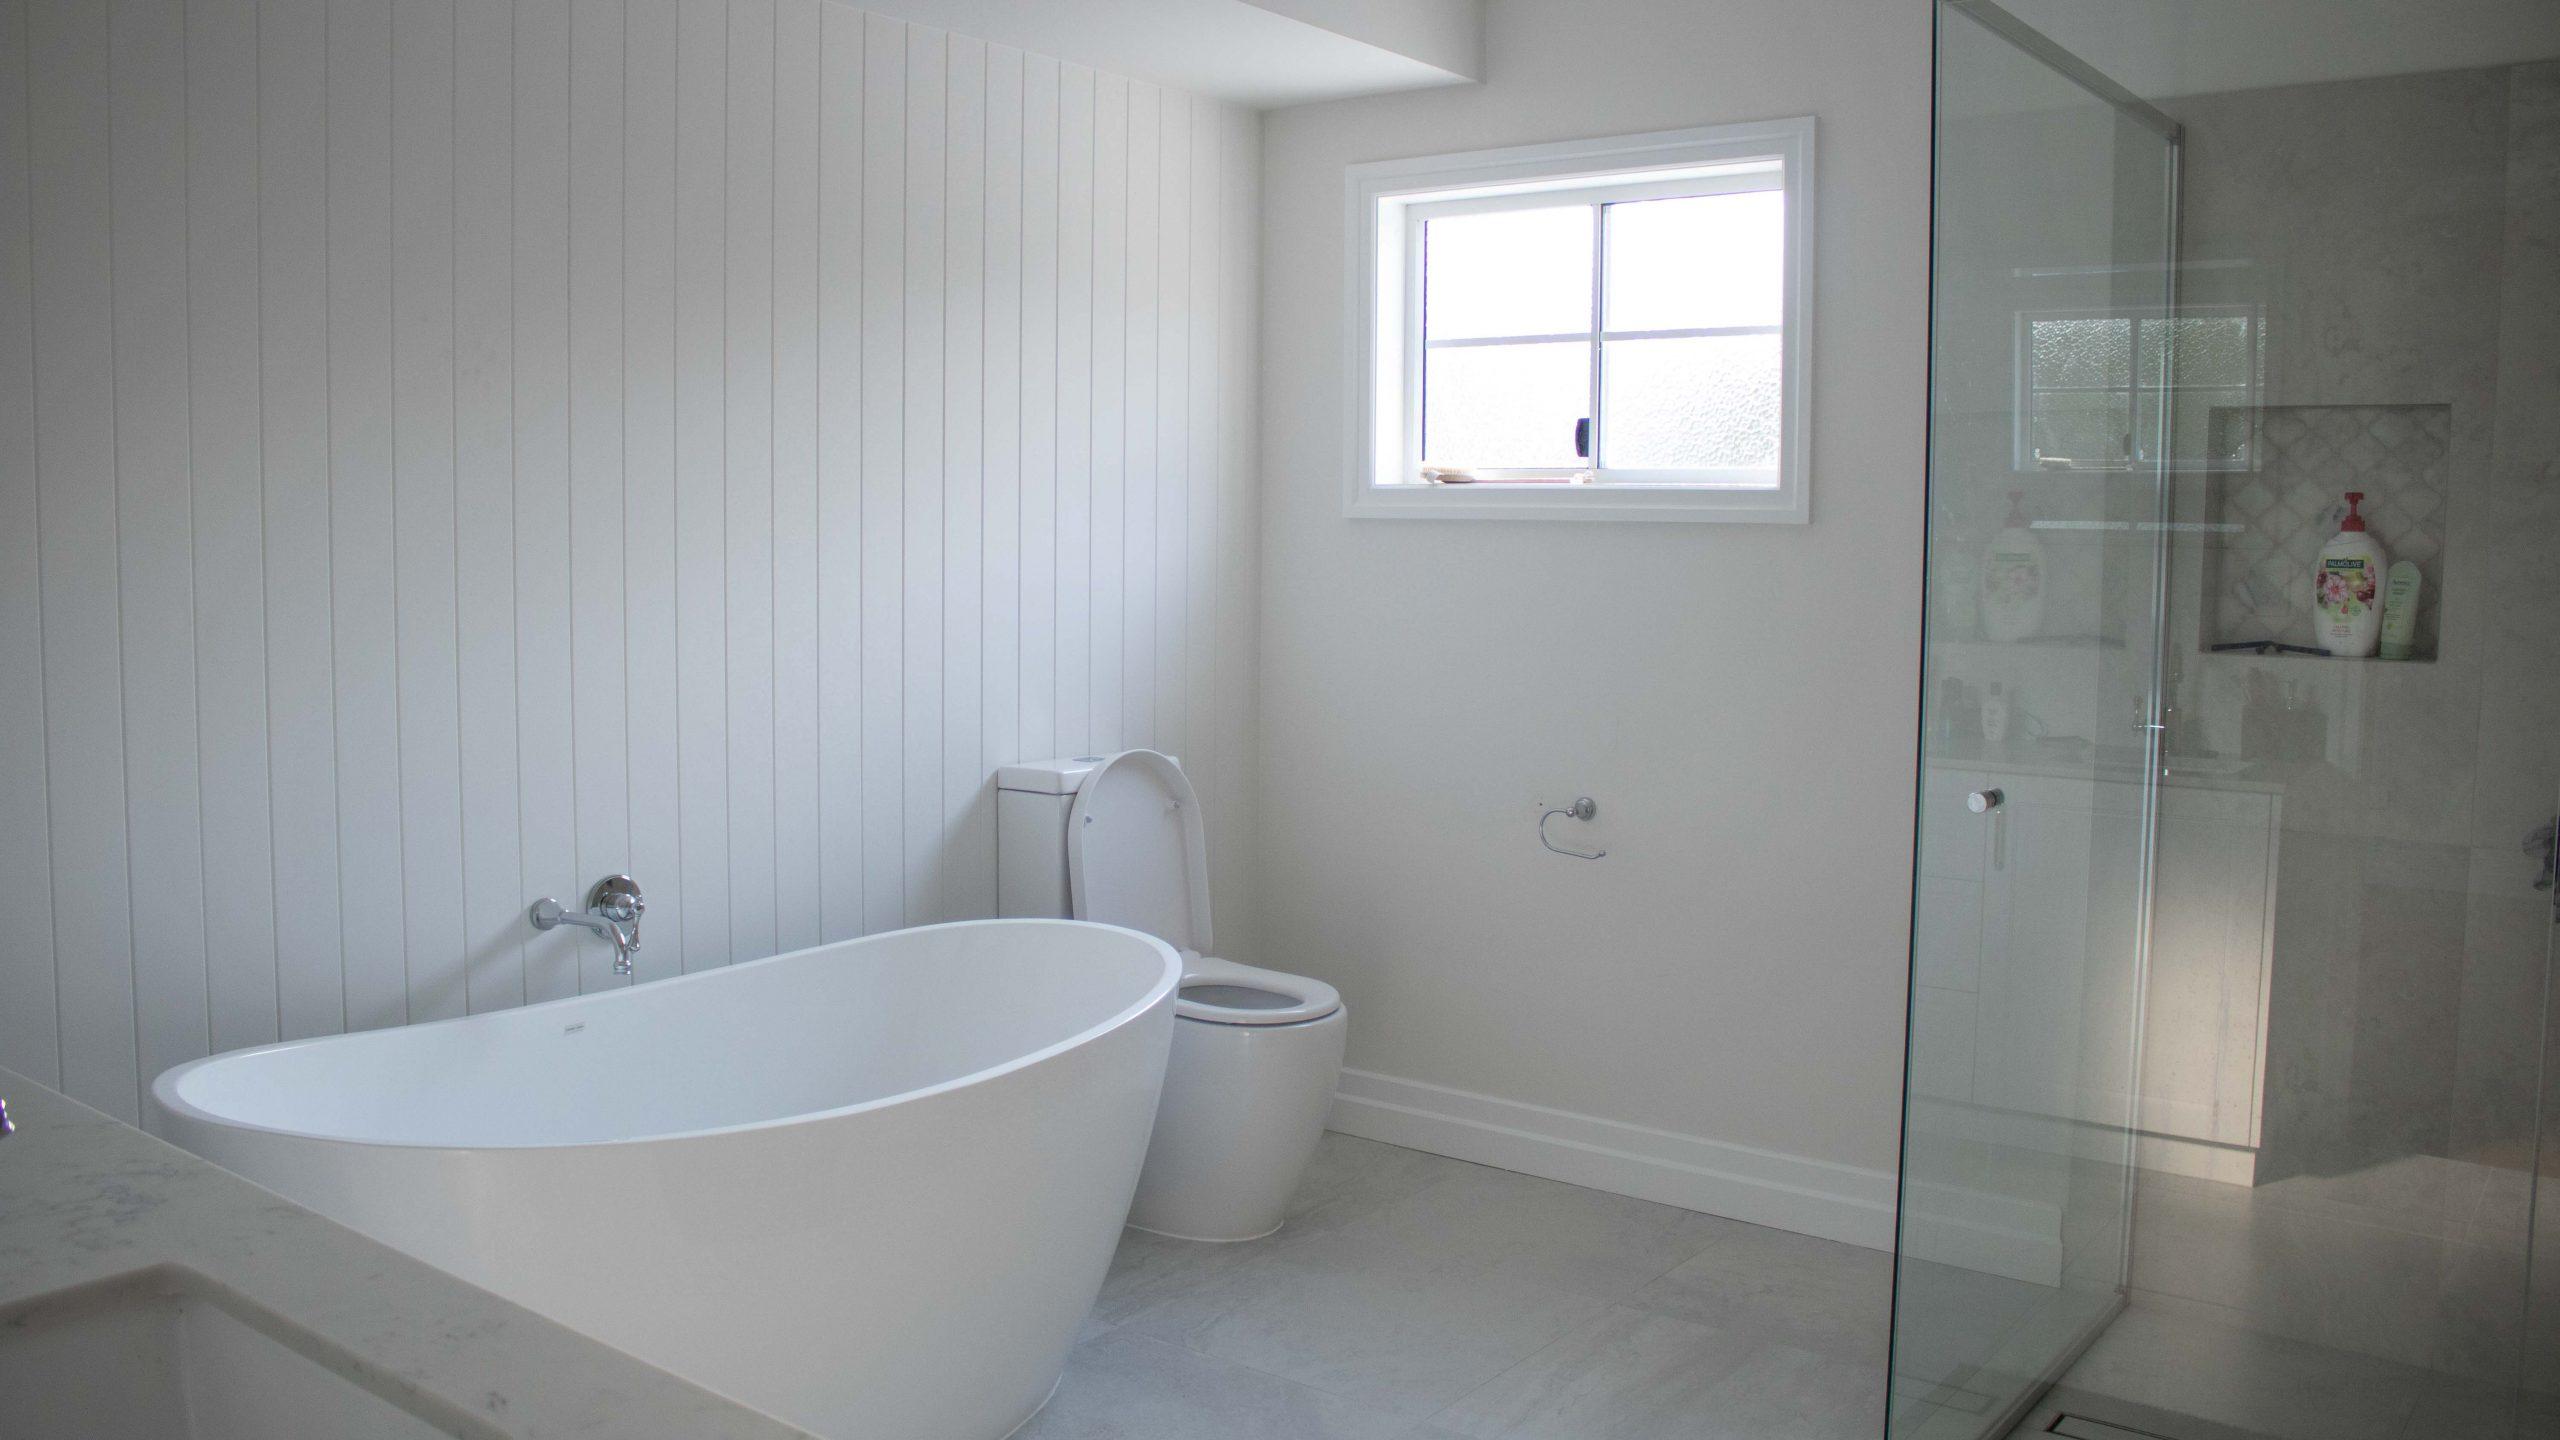 BathroomAGHomes